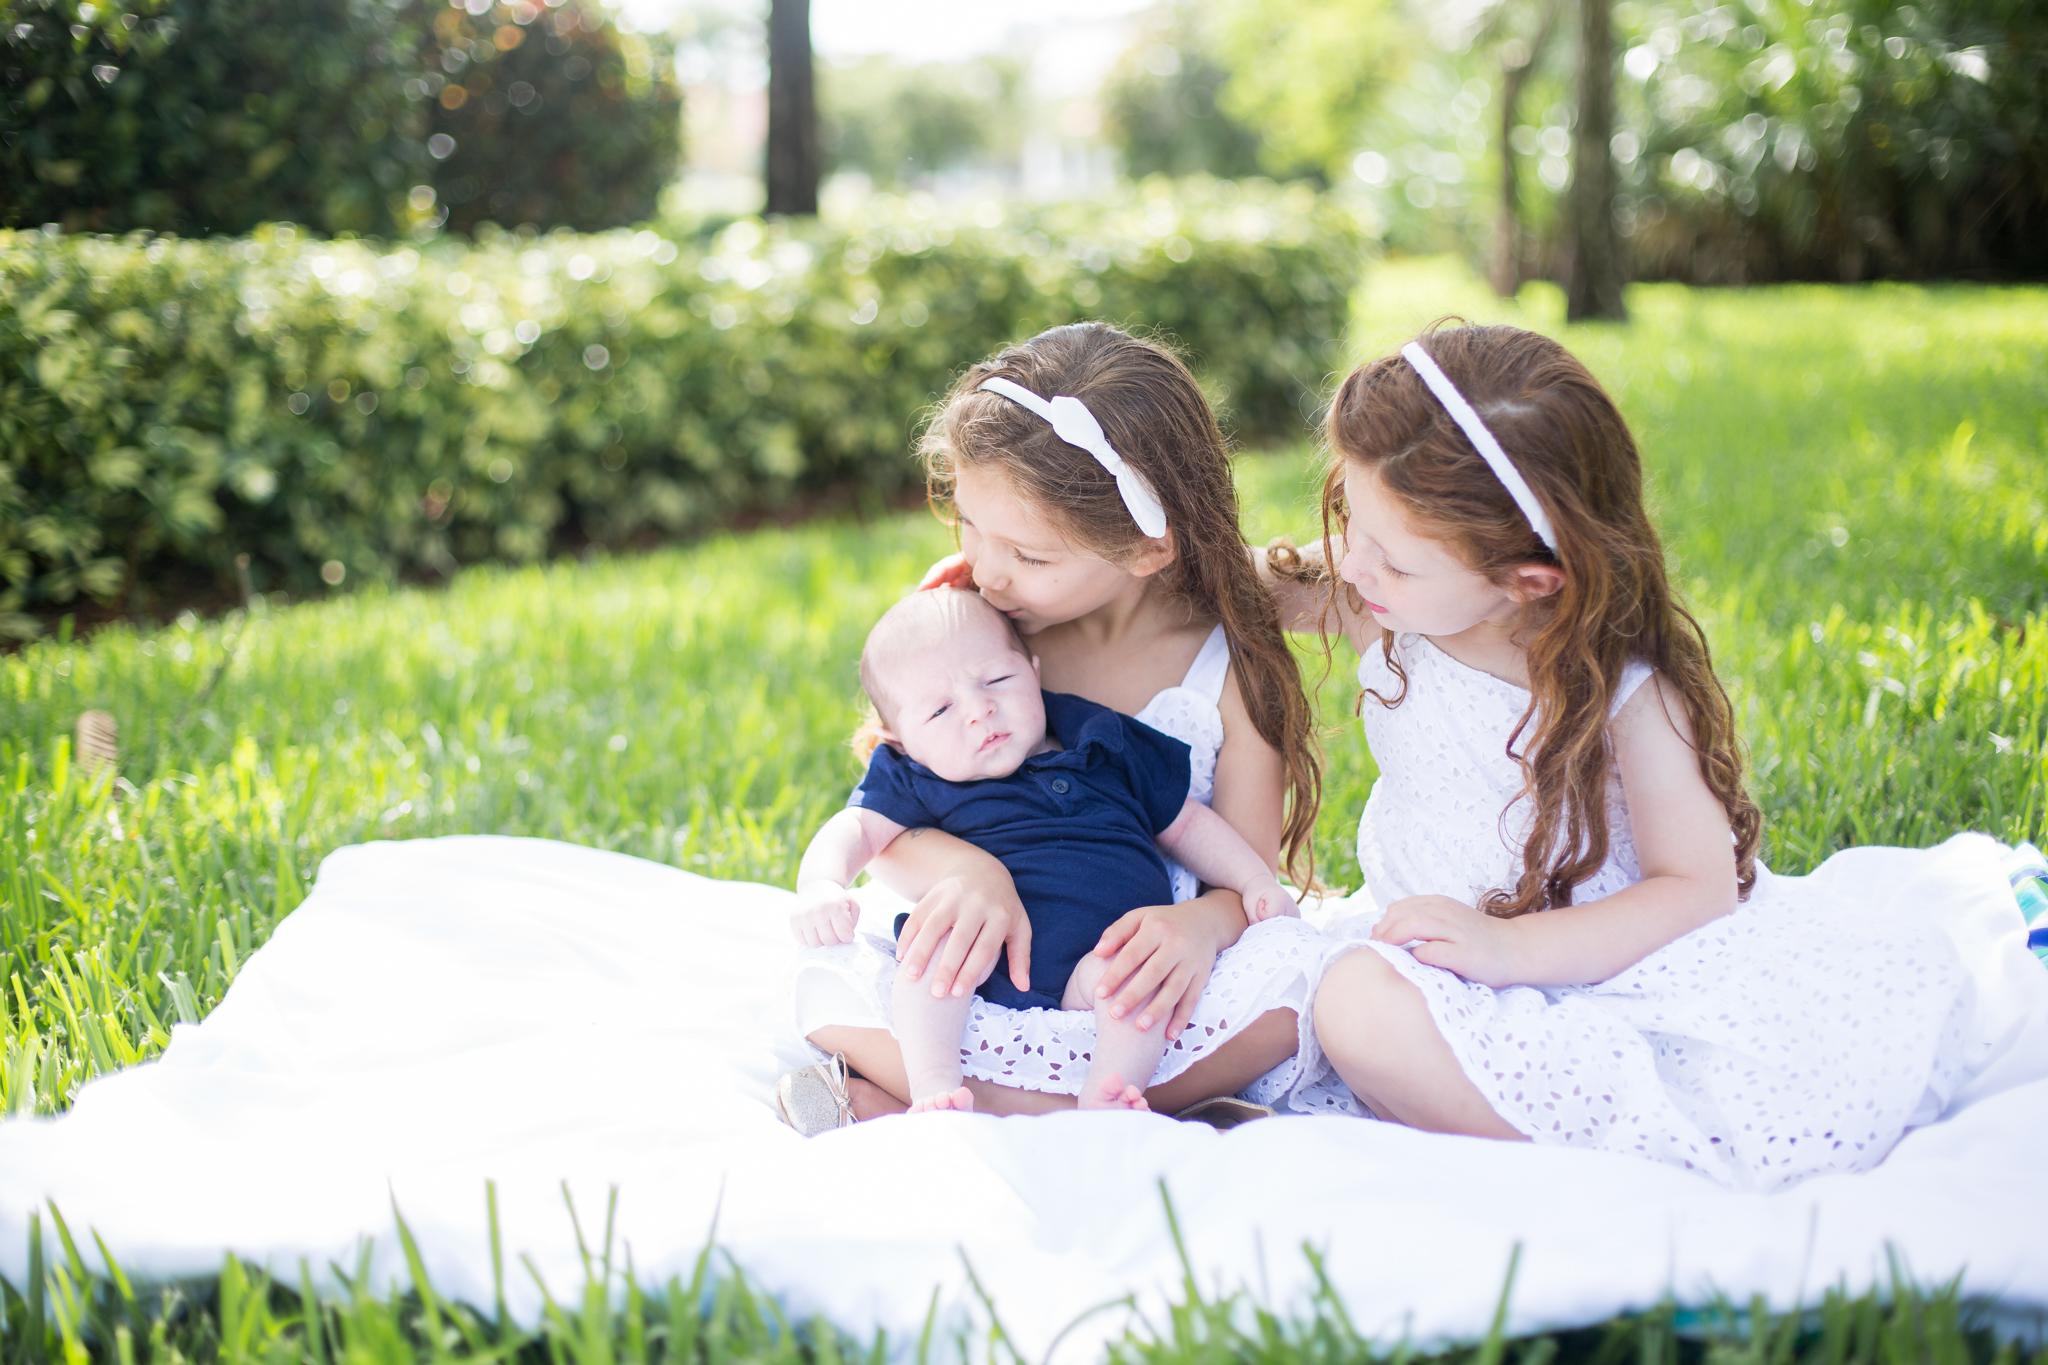 tequesta maternity photographer.jpg